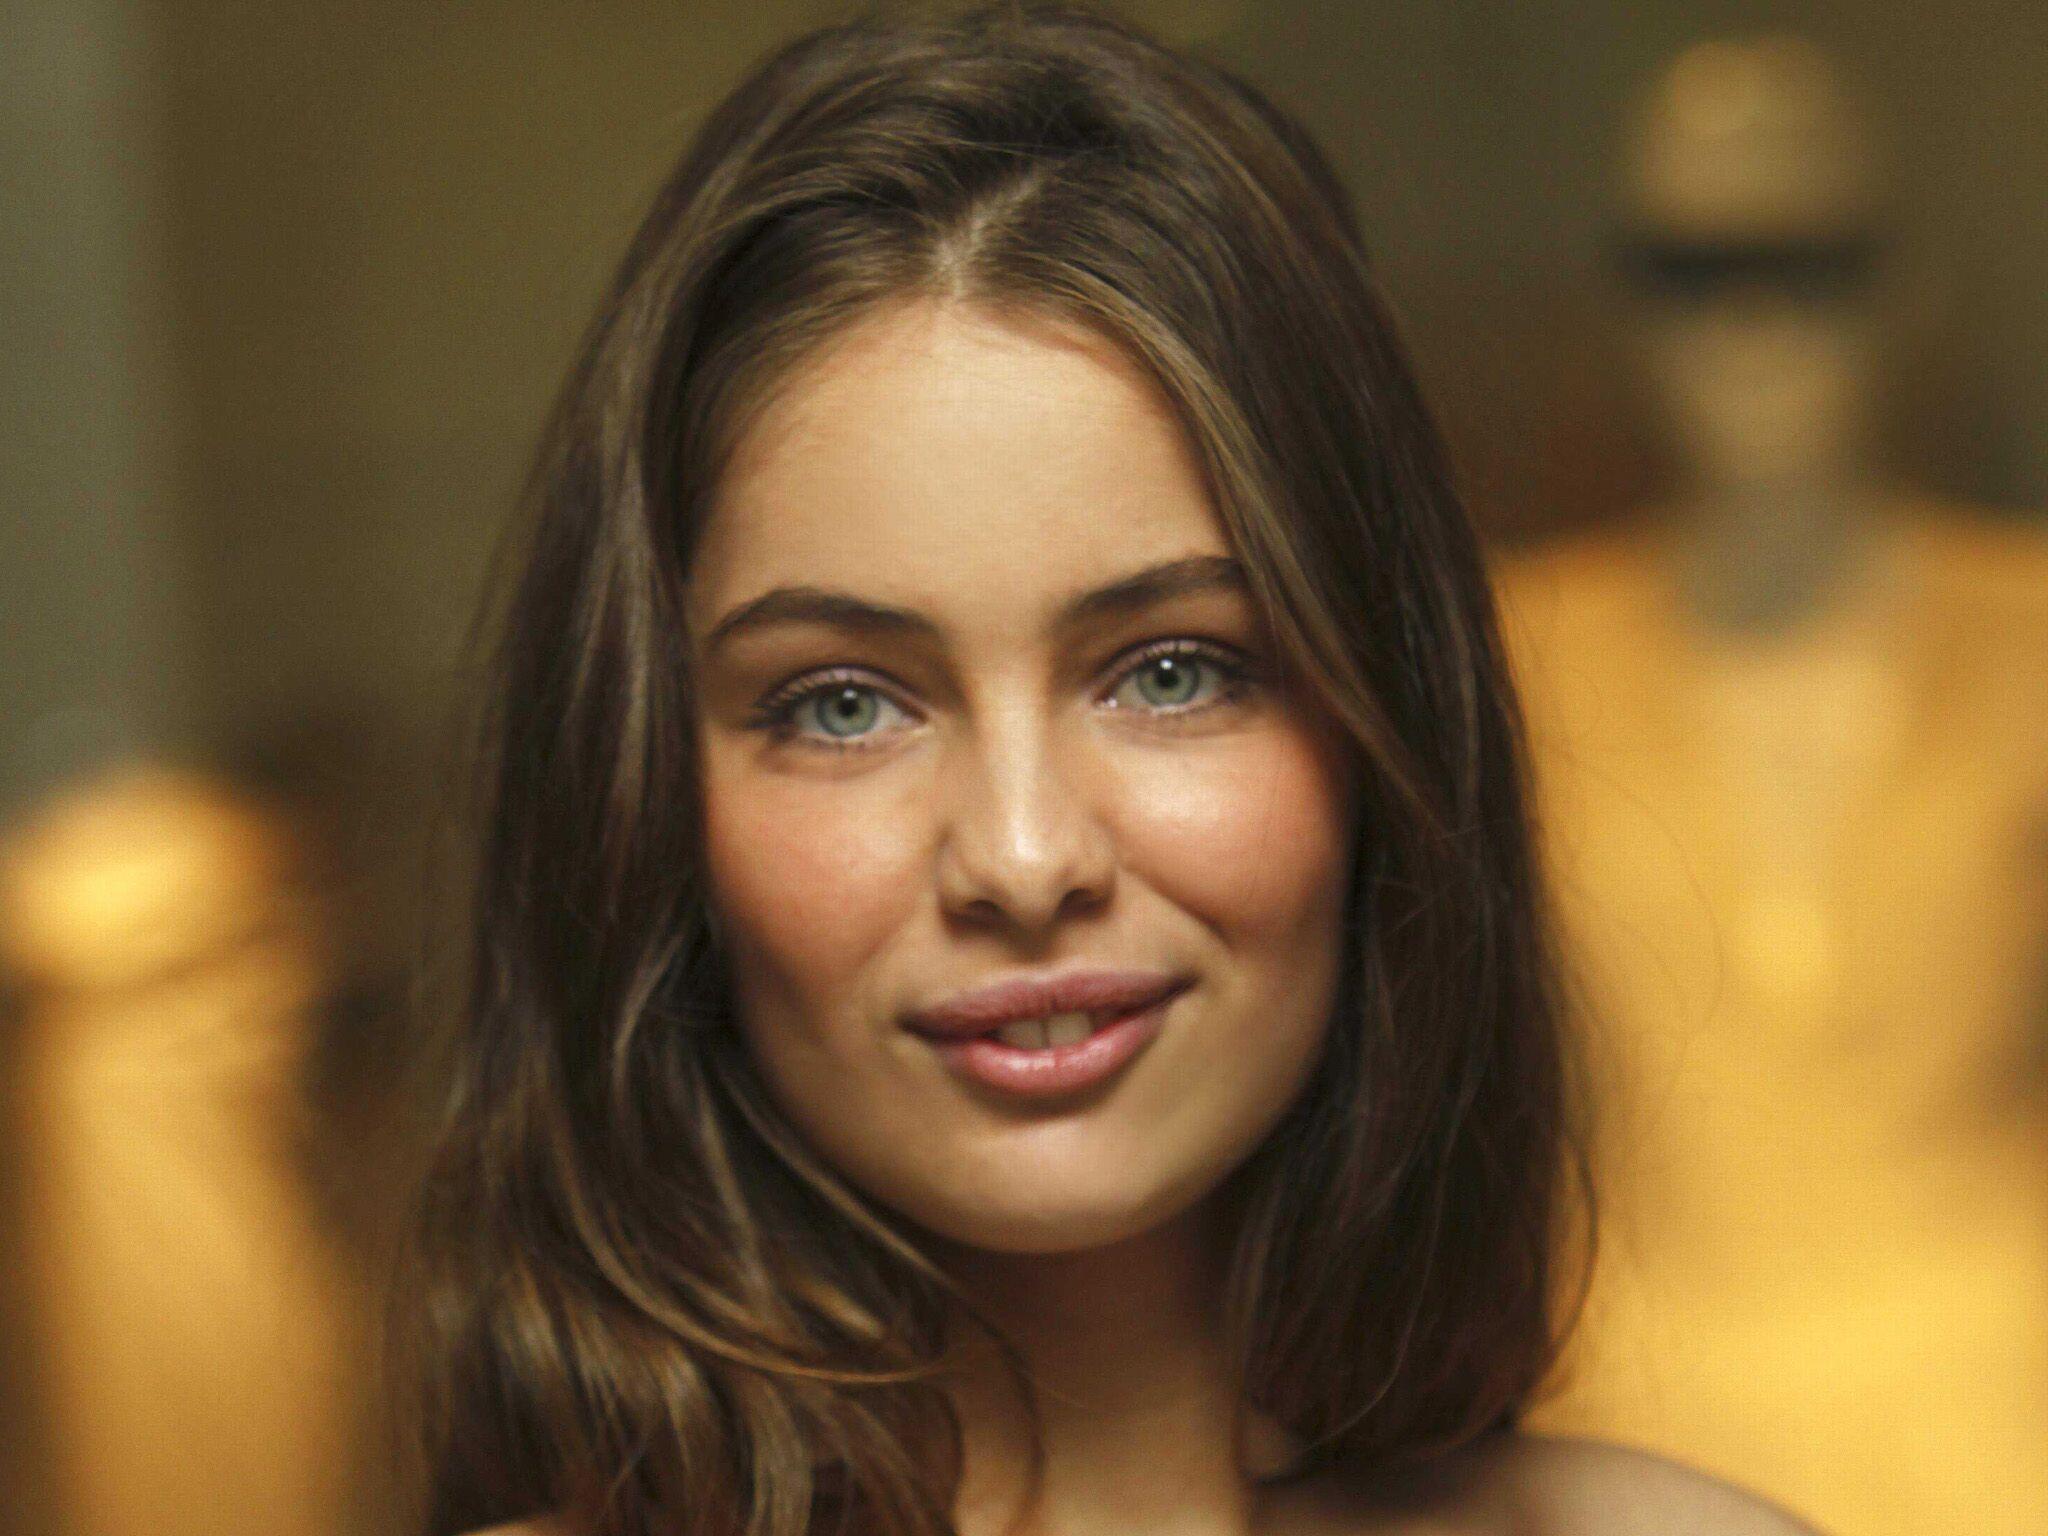 Selfie Svetlana Ivanova nudes (77 foto and video), Pussy, Cleavage, Selfie, butt 2015